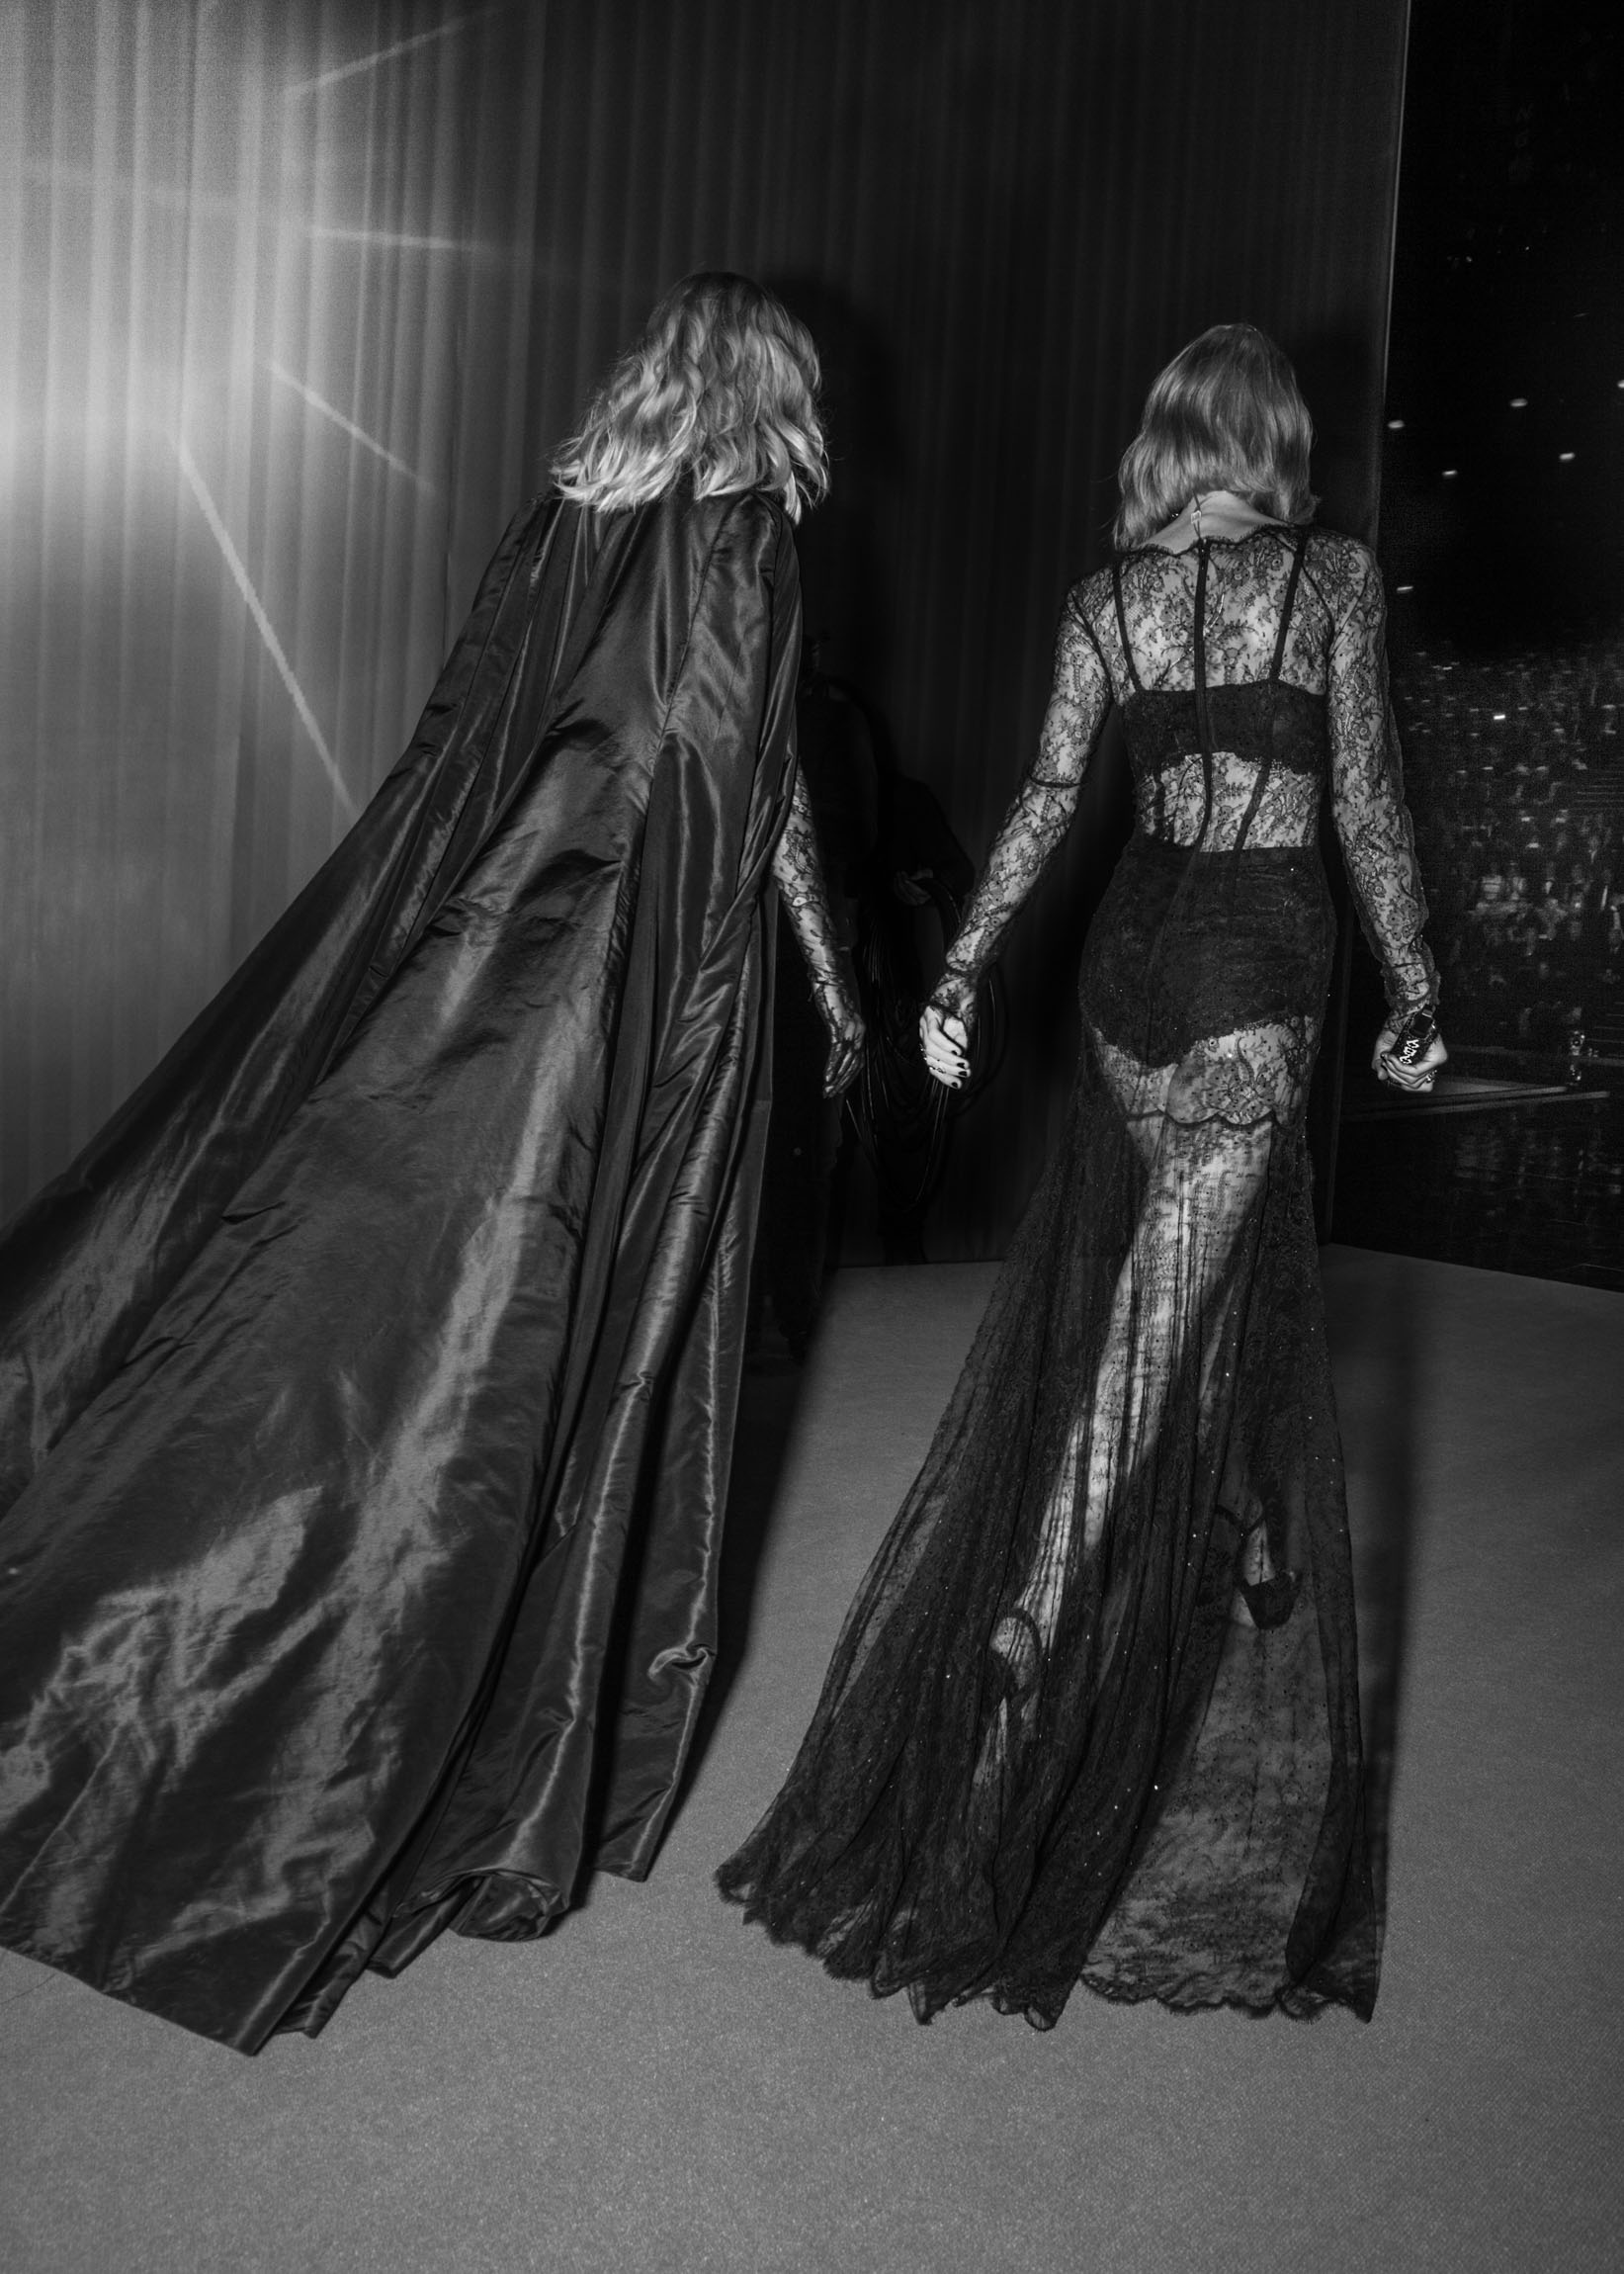 Karlie Kloss, Taylor Swift, London, 2014